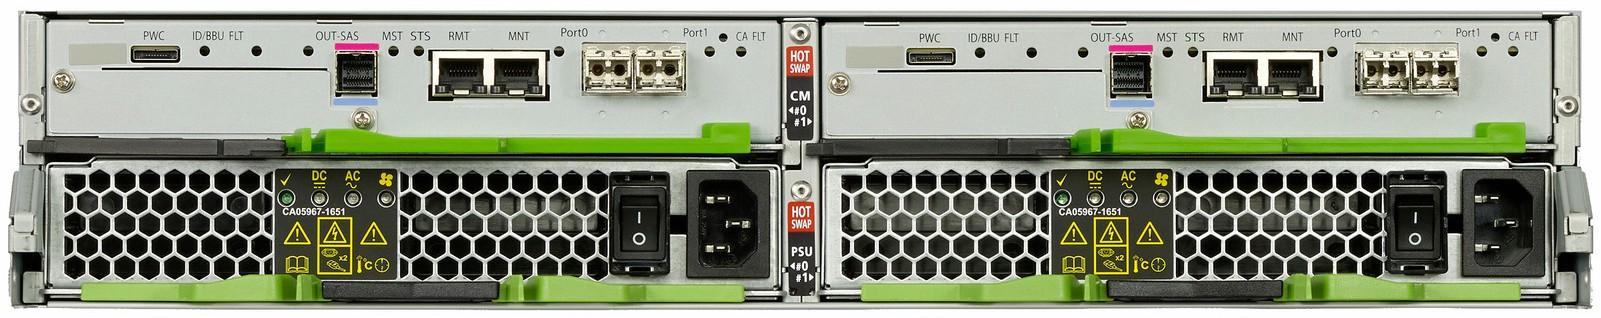 Fujitsu ETERNUS DX60 S4 Rear